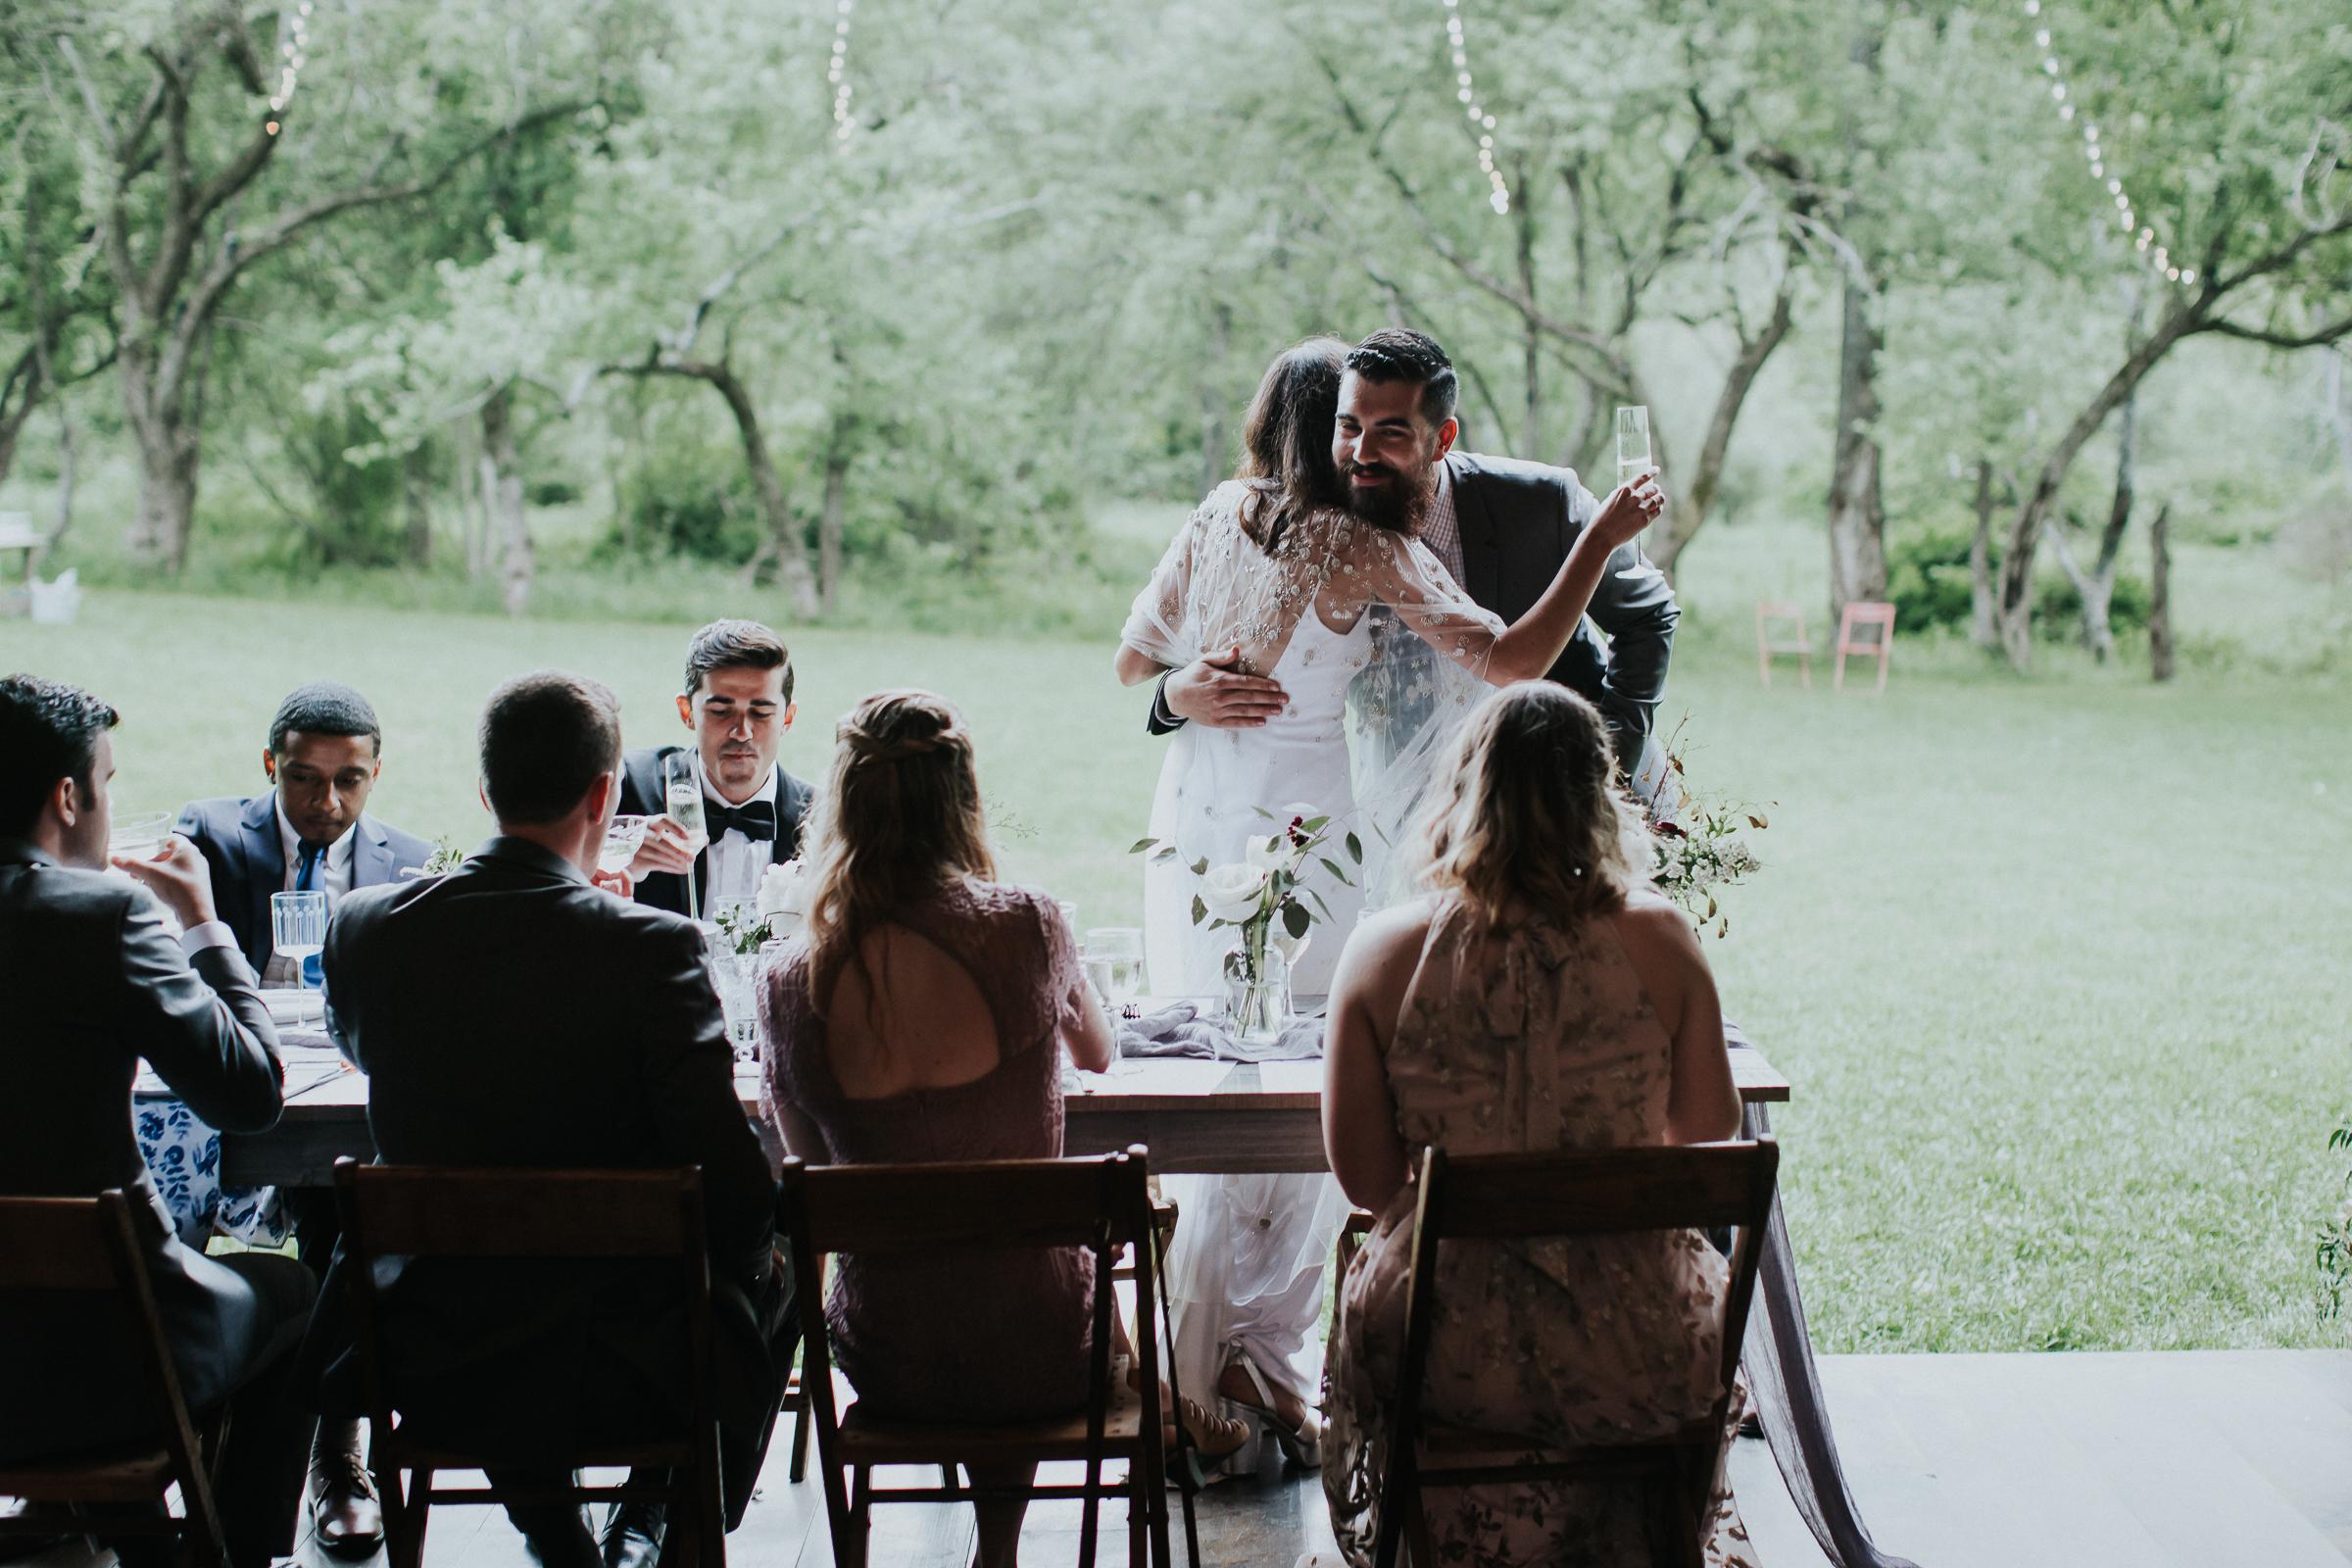 Handsome-Hollow-Long-Eddy-Catskills-New-York-Fine-Art-Documentary-Wedding-Photographer-120.jpg